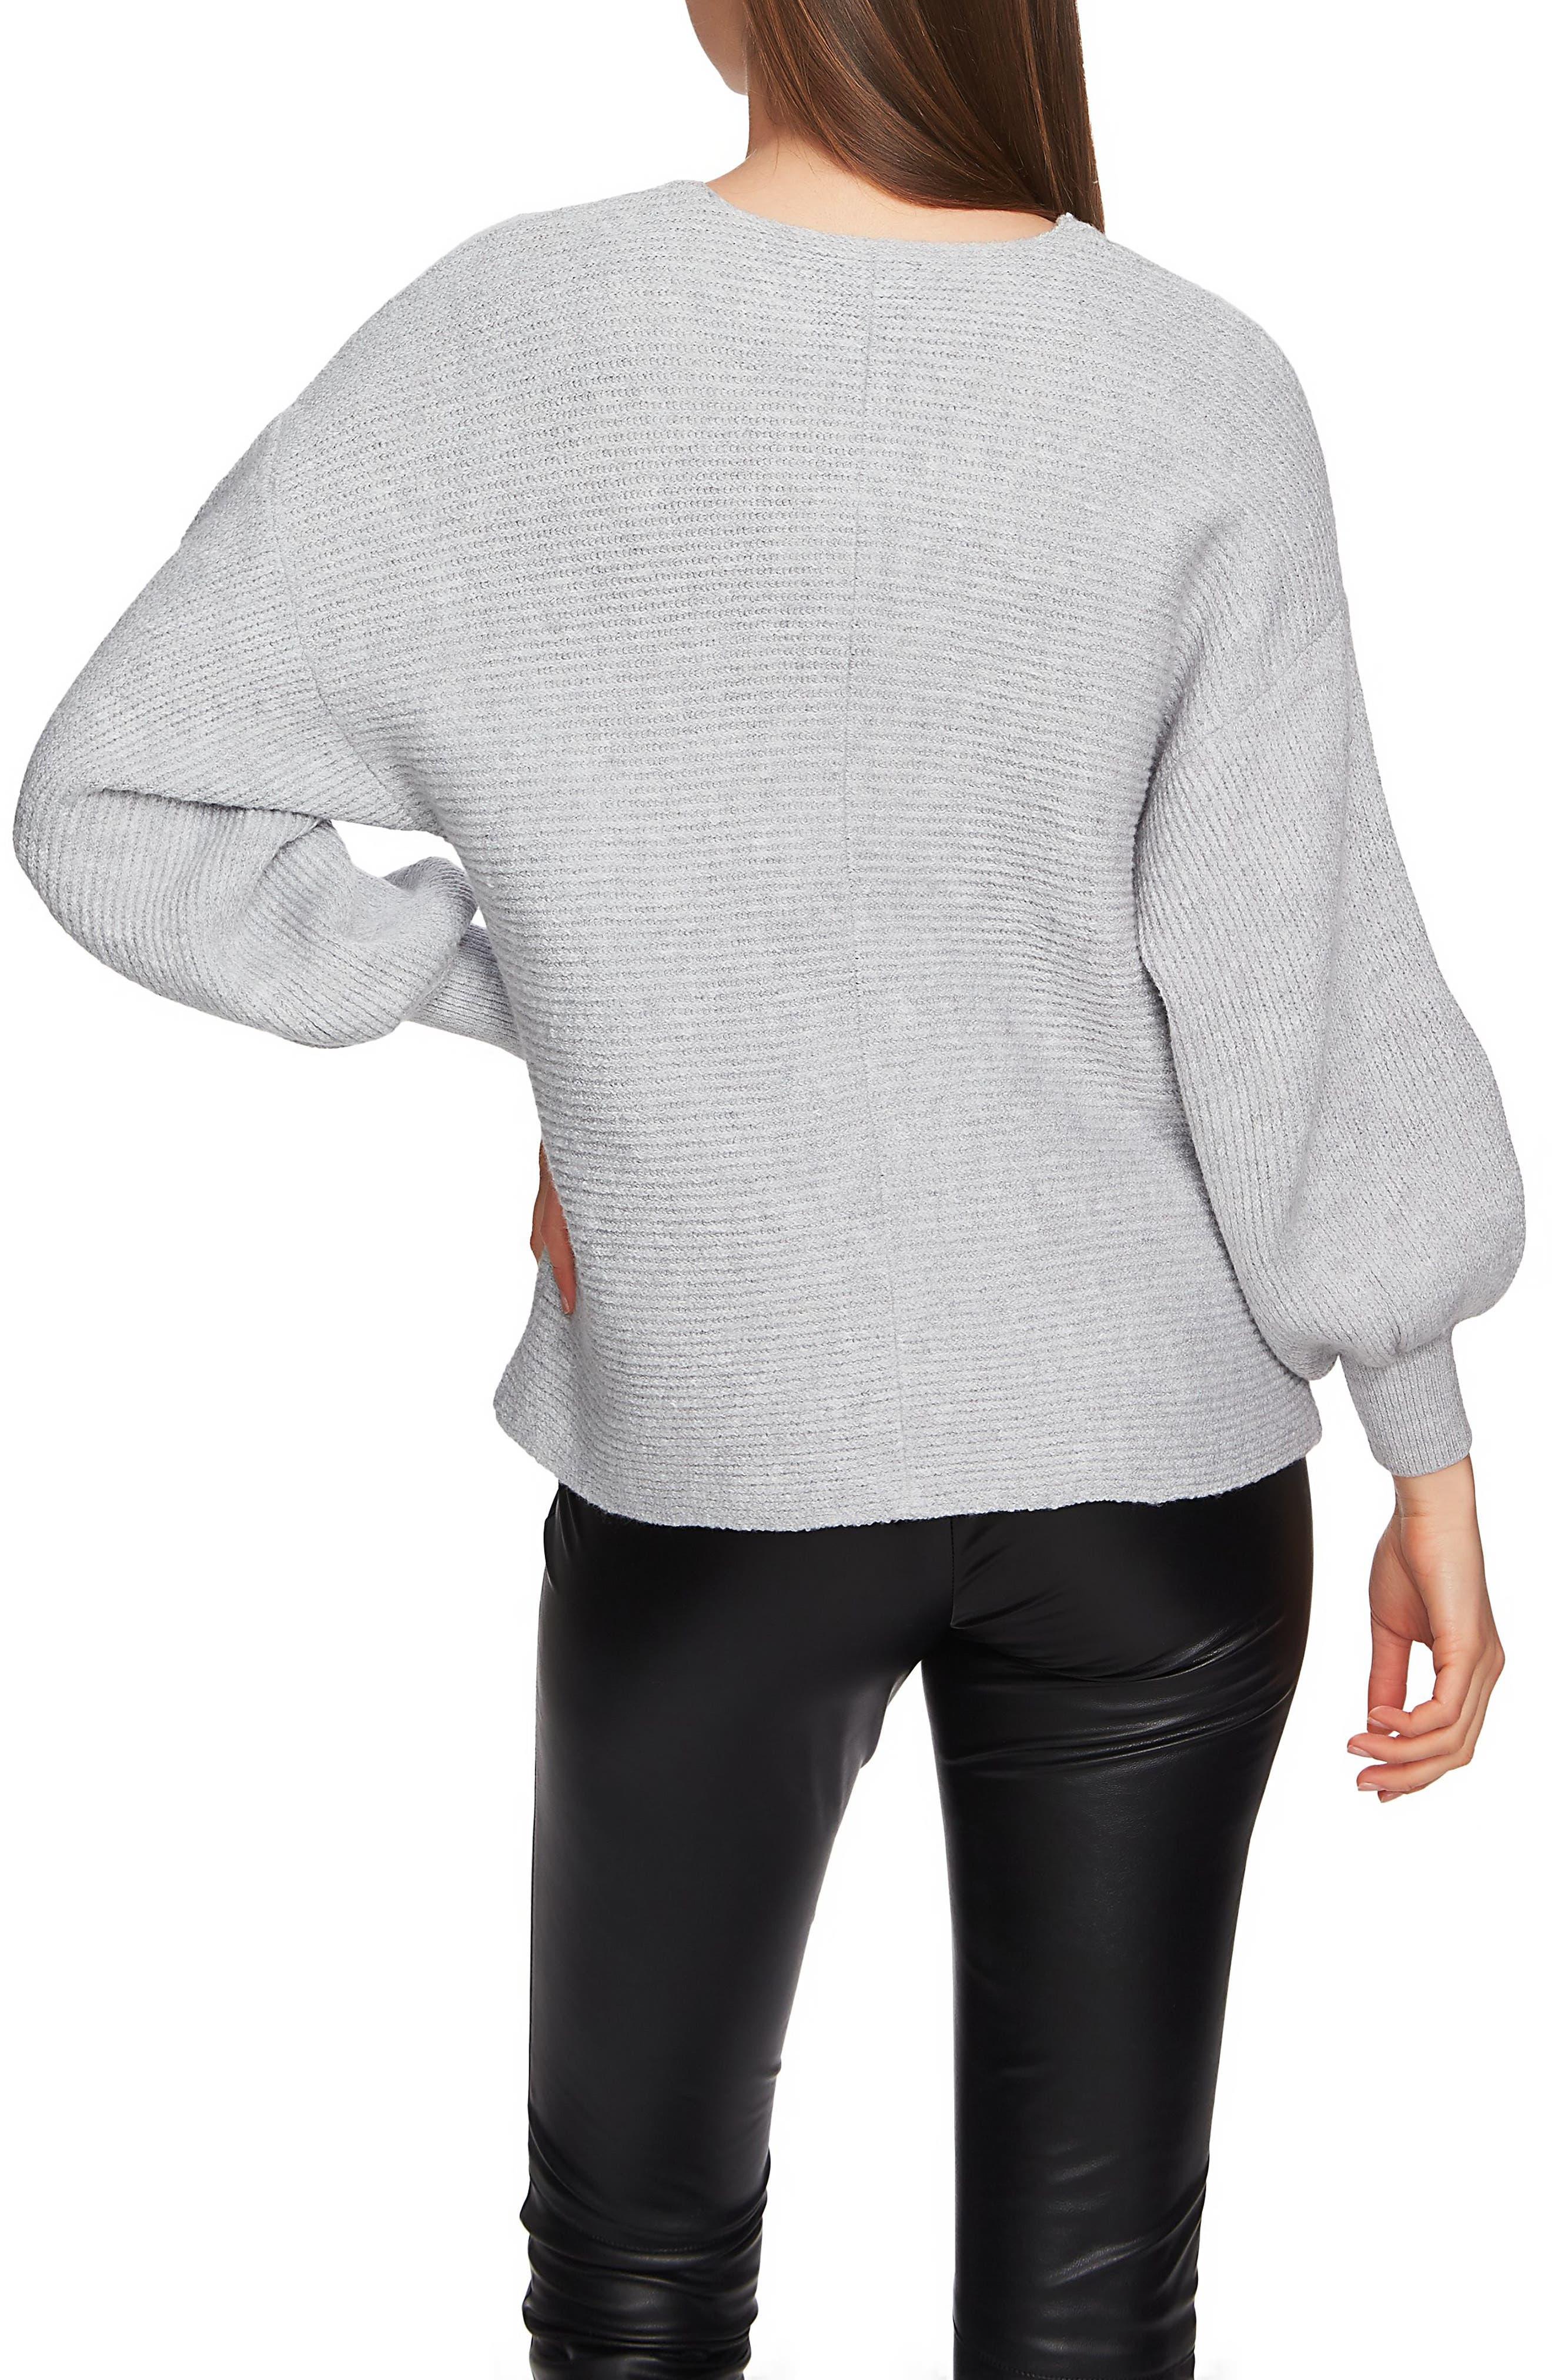 Blouson Sleeve V-Neck Sweater,                             Alternate thumbnail 2, color,                             LIGHT HEATHER GREY